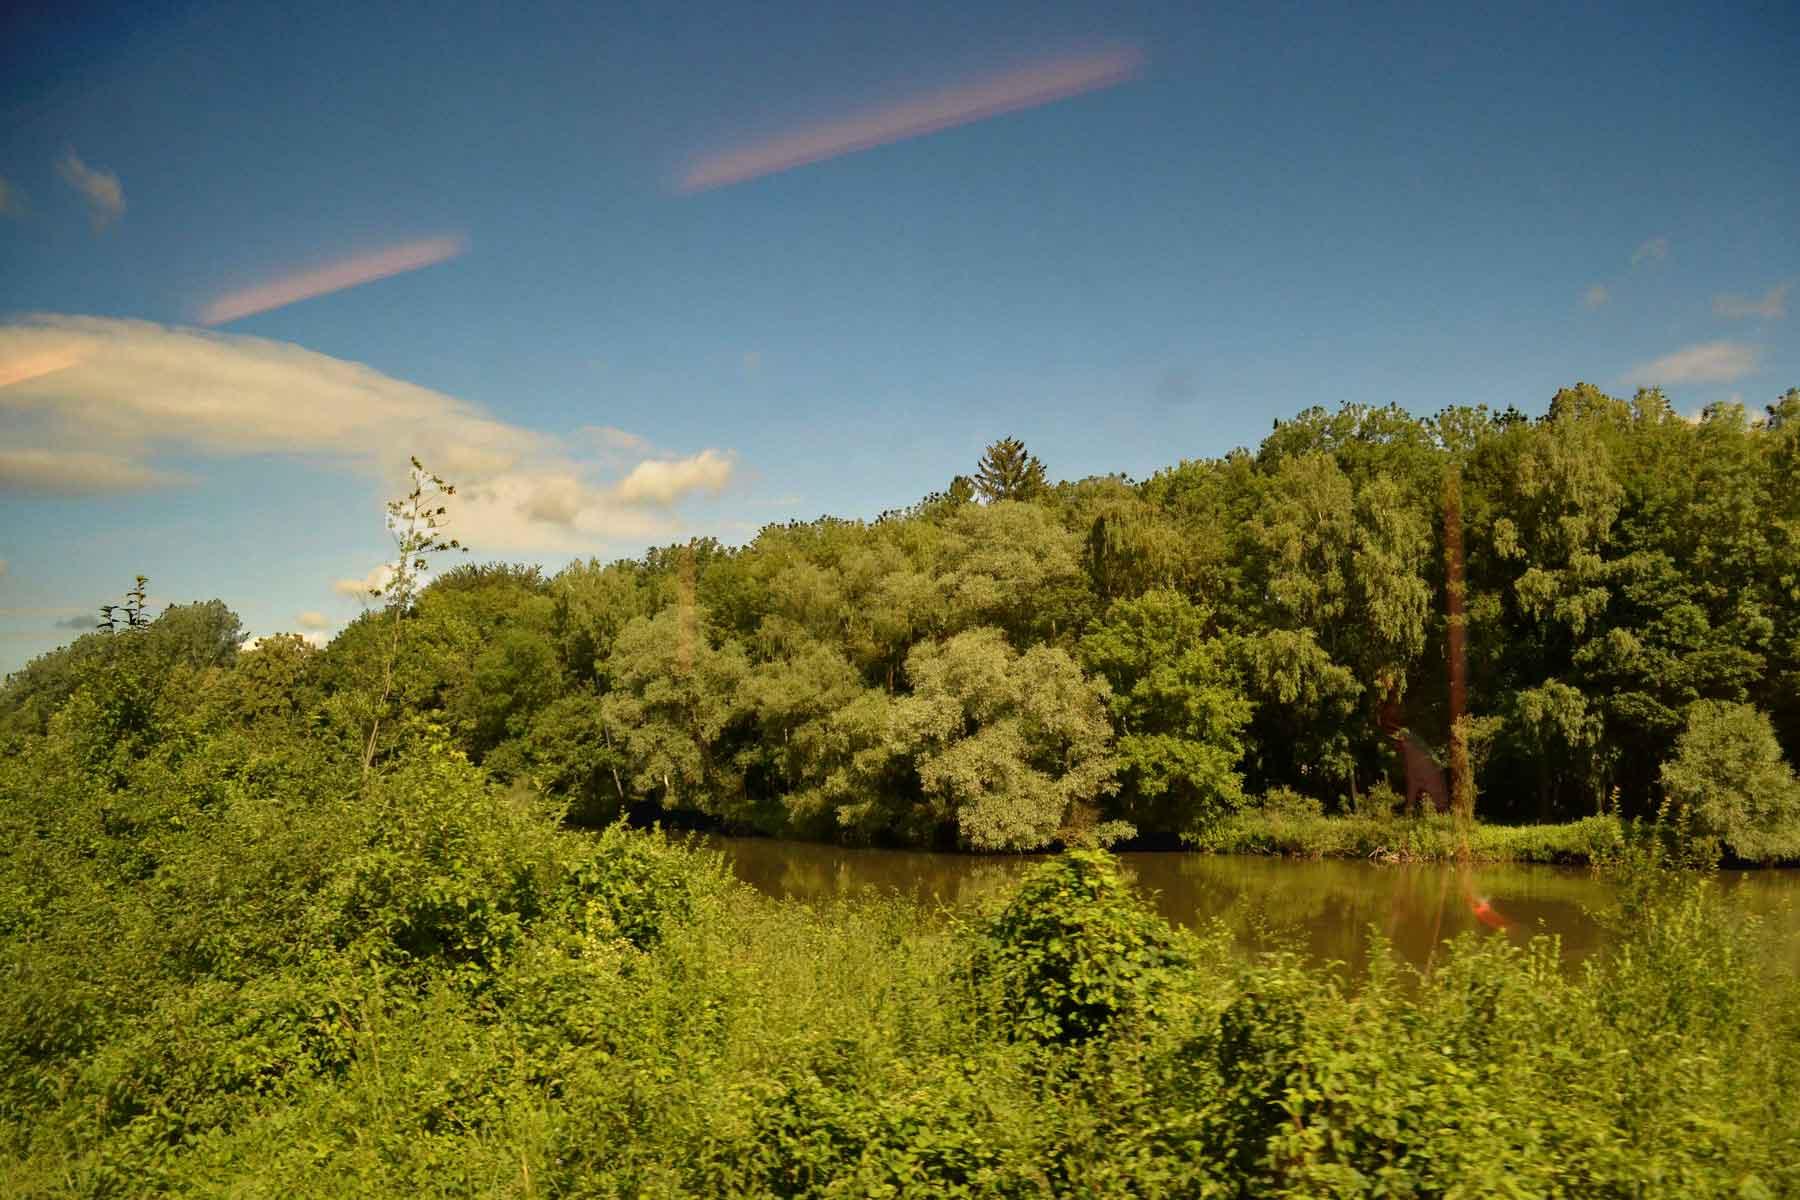 Rivers and streams, Germany by train. Image©gunjanvirk